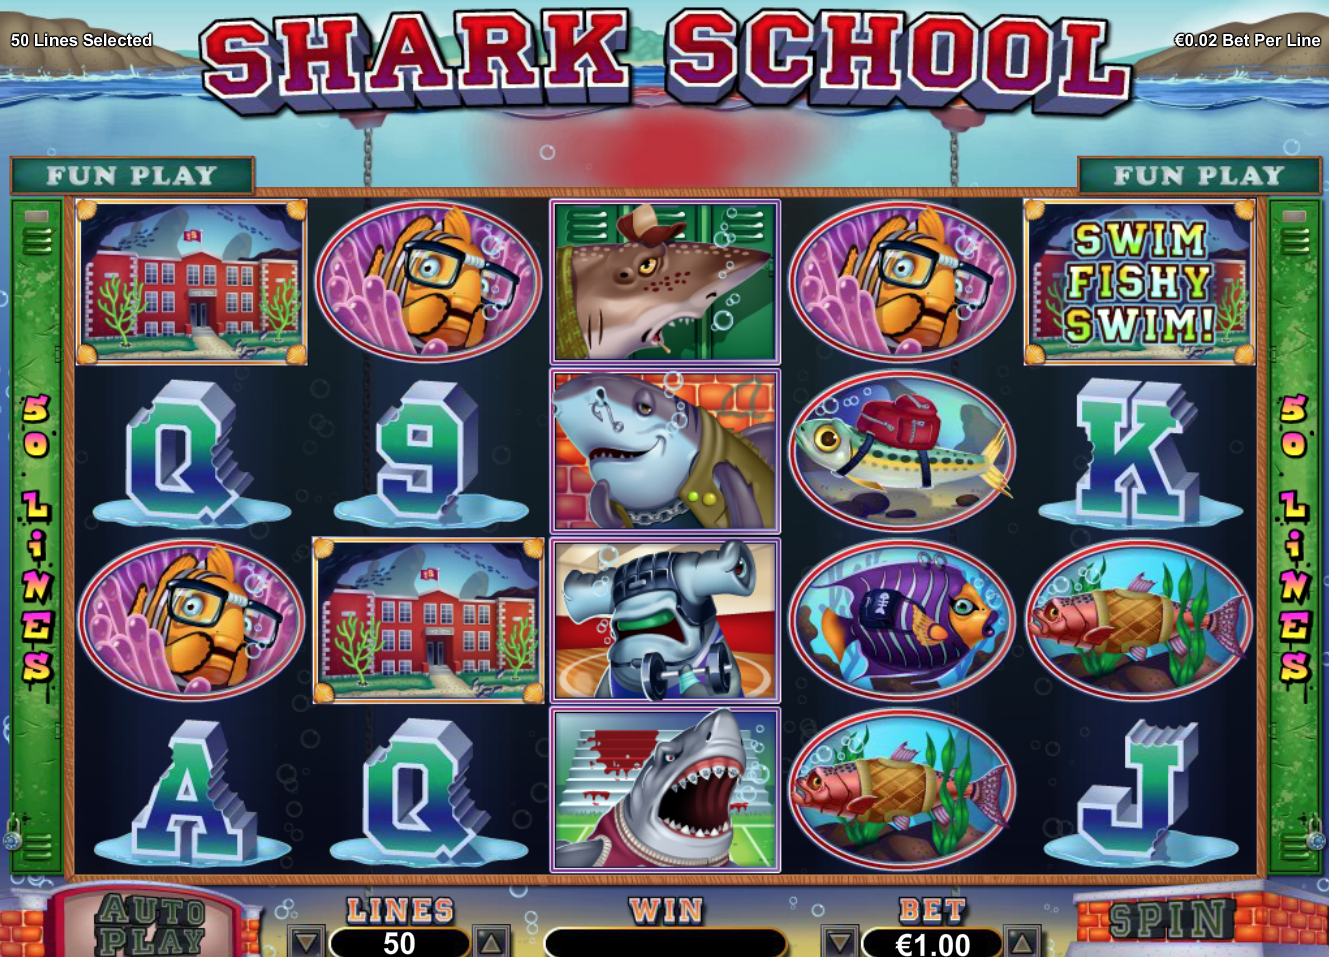 shark school free spins feature